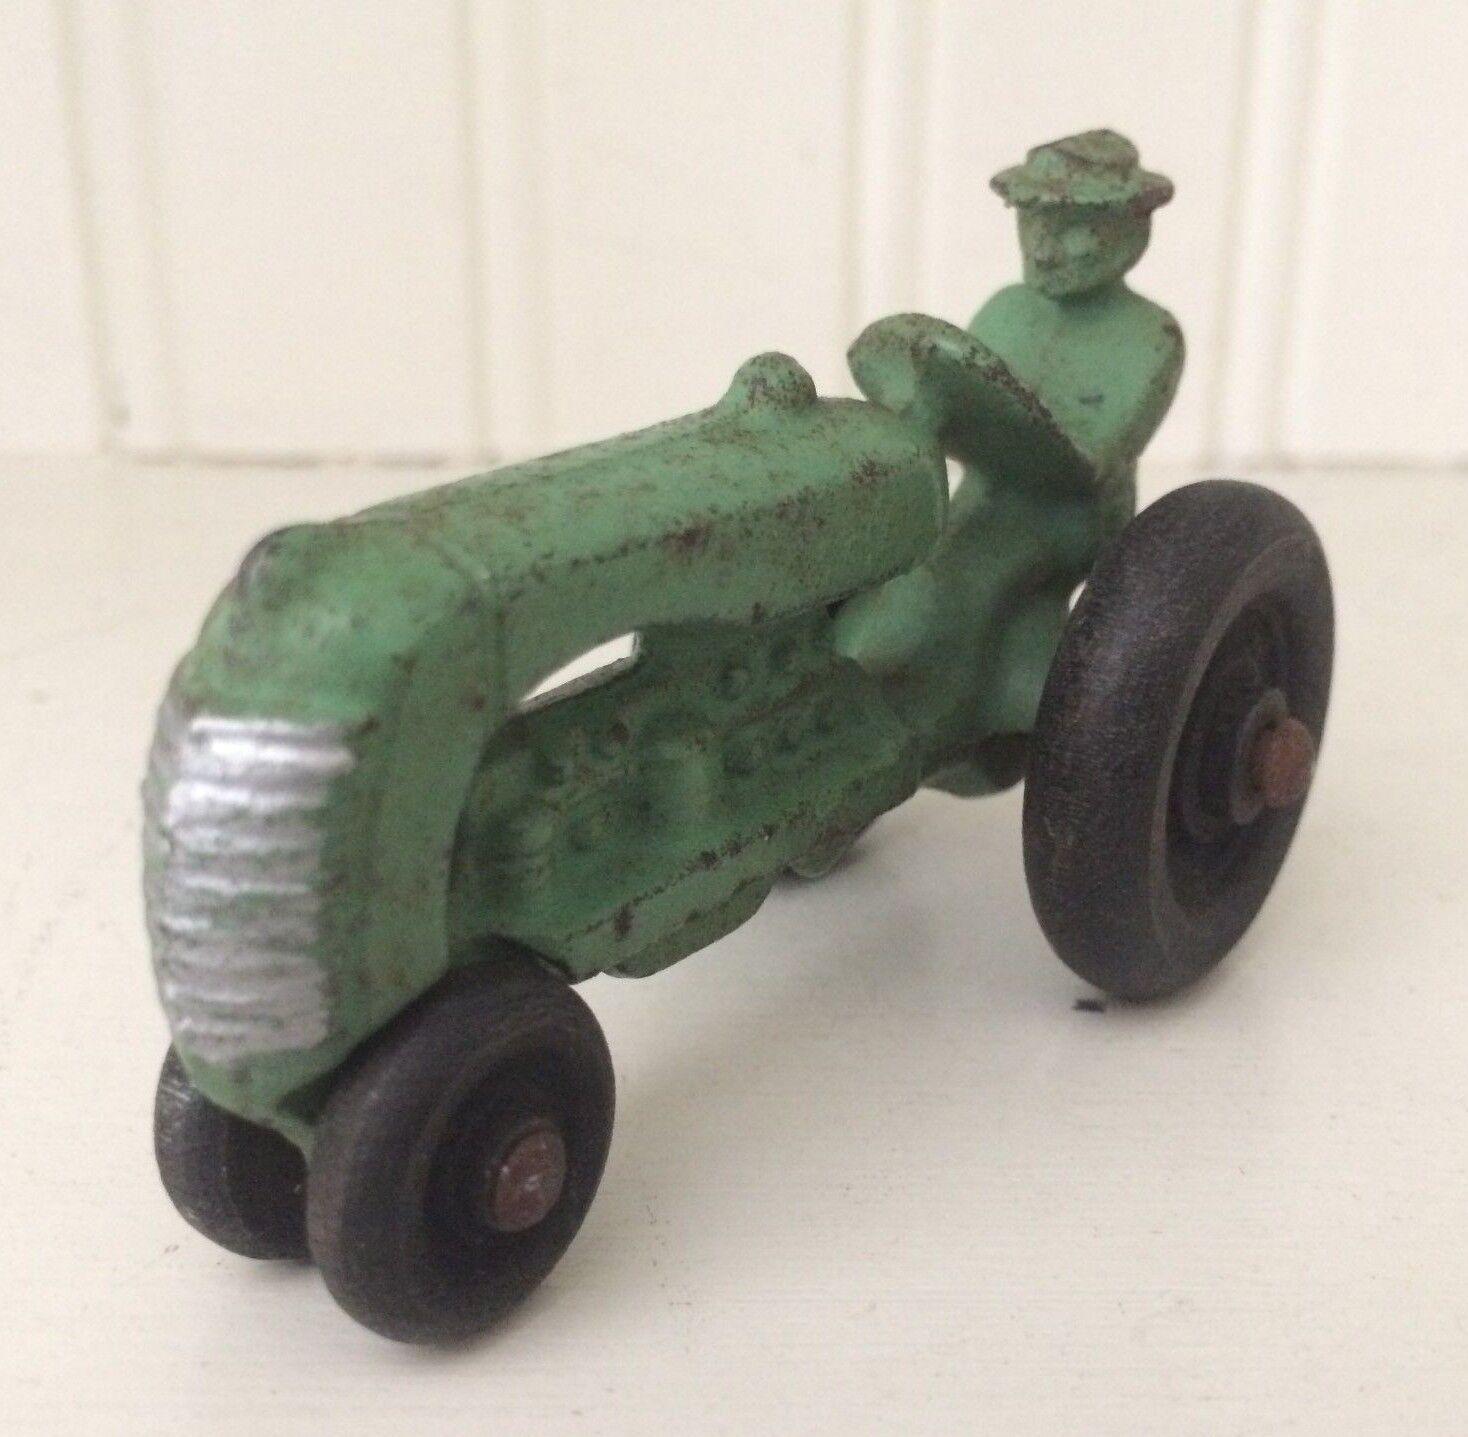 VINTAGE ARCADE TOYS CAST IRON TOY OLIVER FARM TRACTOR- MIDGET 1938- green